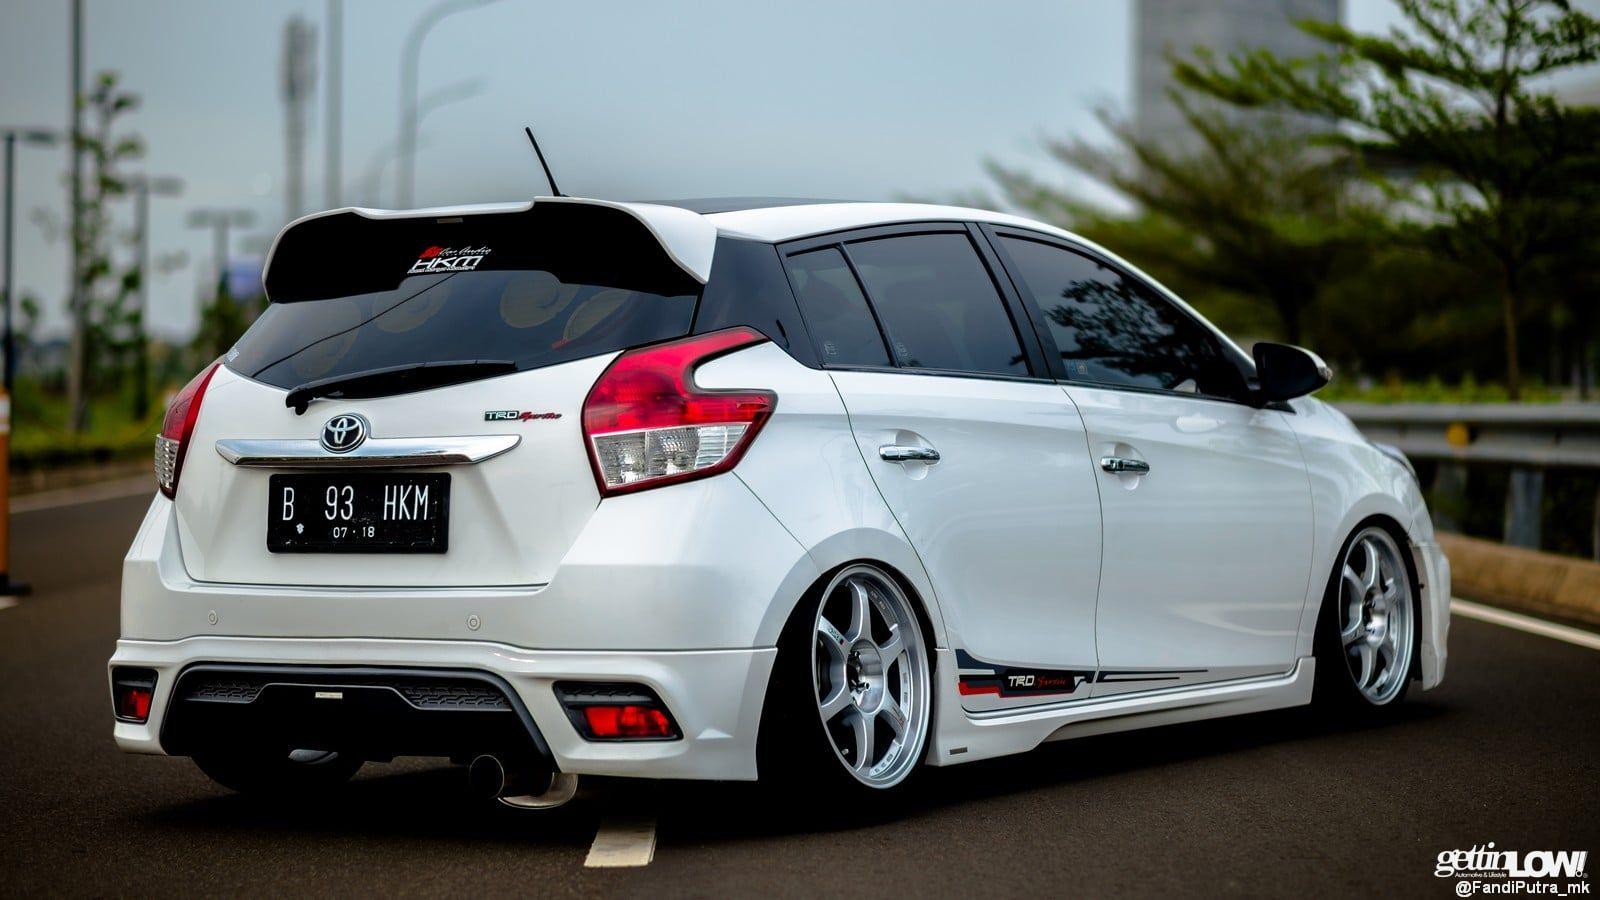 Kelebihan Mobil Toyota Yaris Perbandingan Harga